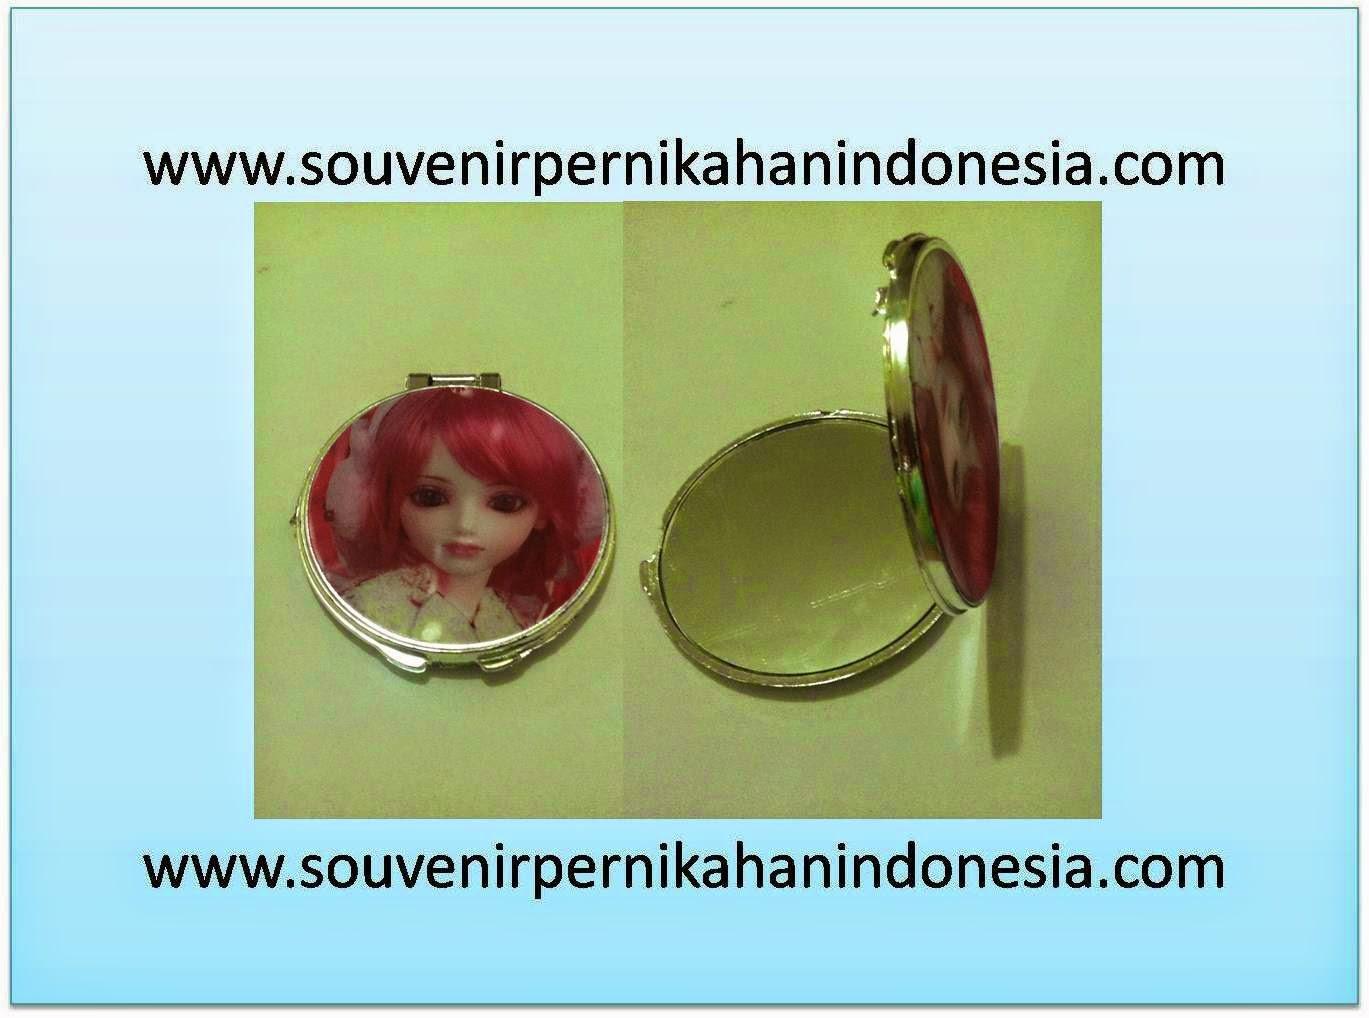 Souvenir Kaca Pernikahan 0813 3363 8798 Cermin Sovenir Rias Di Hadi Jsm Terlengkap Dan Terpercaya Seluruh Indonesia Nusantara